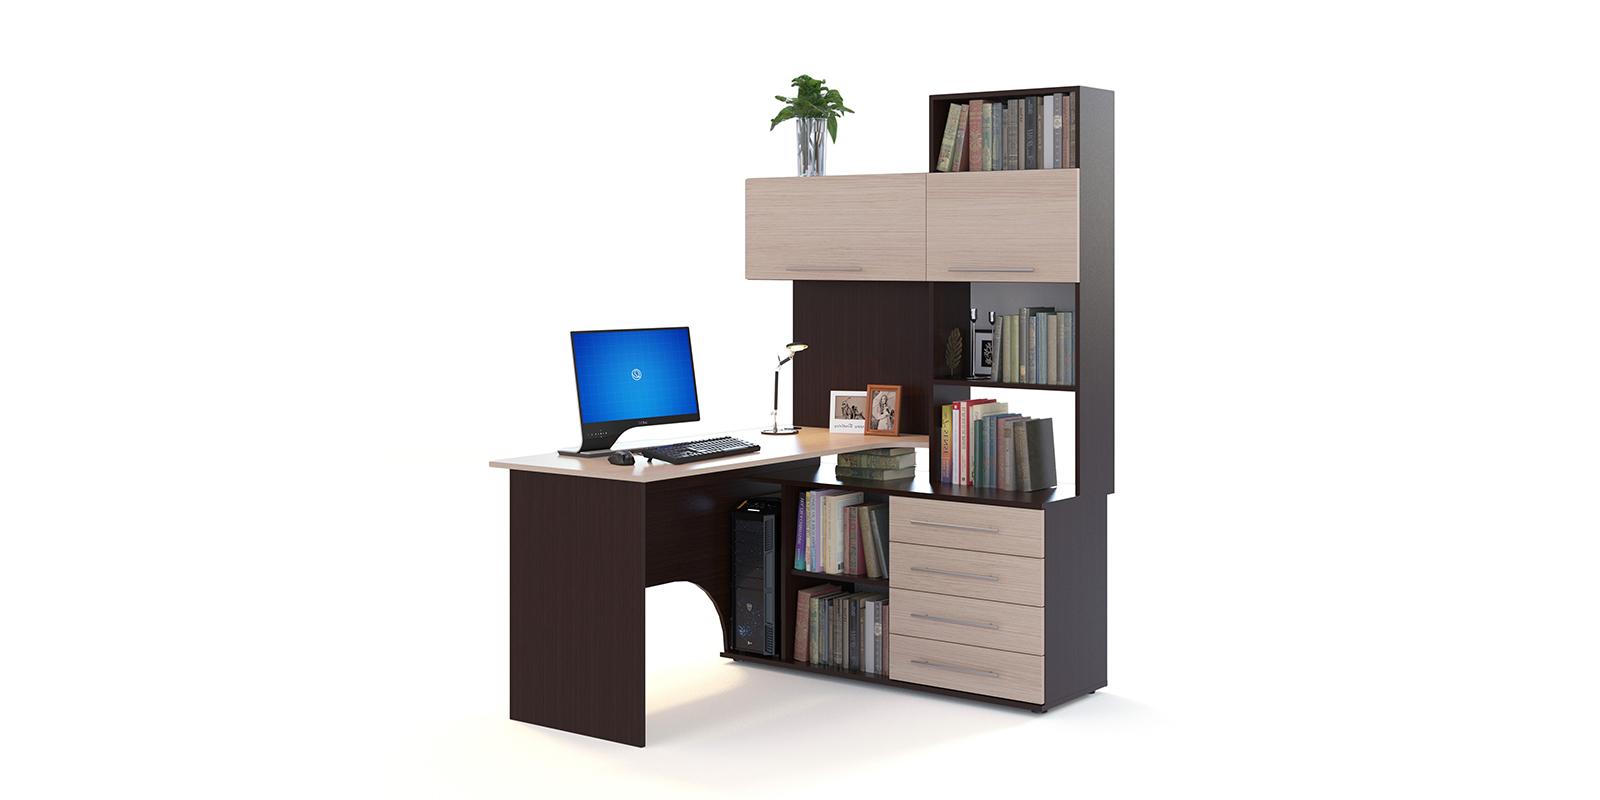 Стол компьютерный HomeMe Мерида AFU0084000